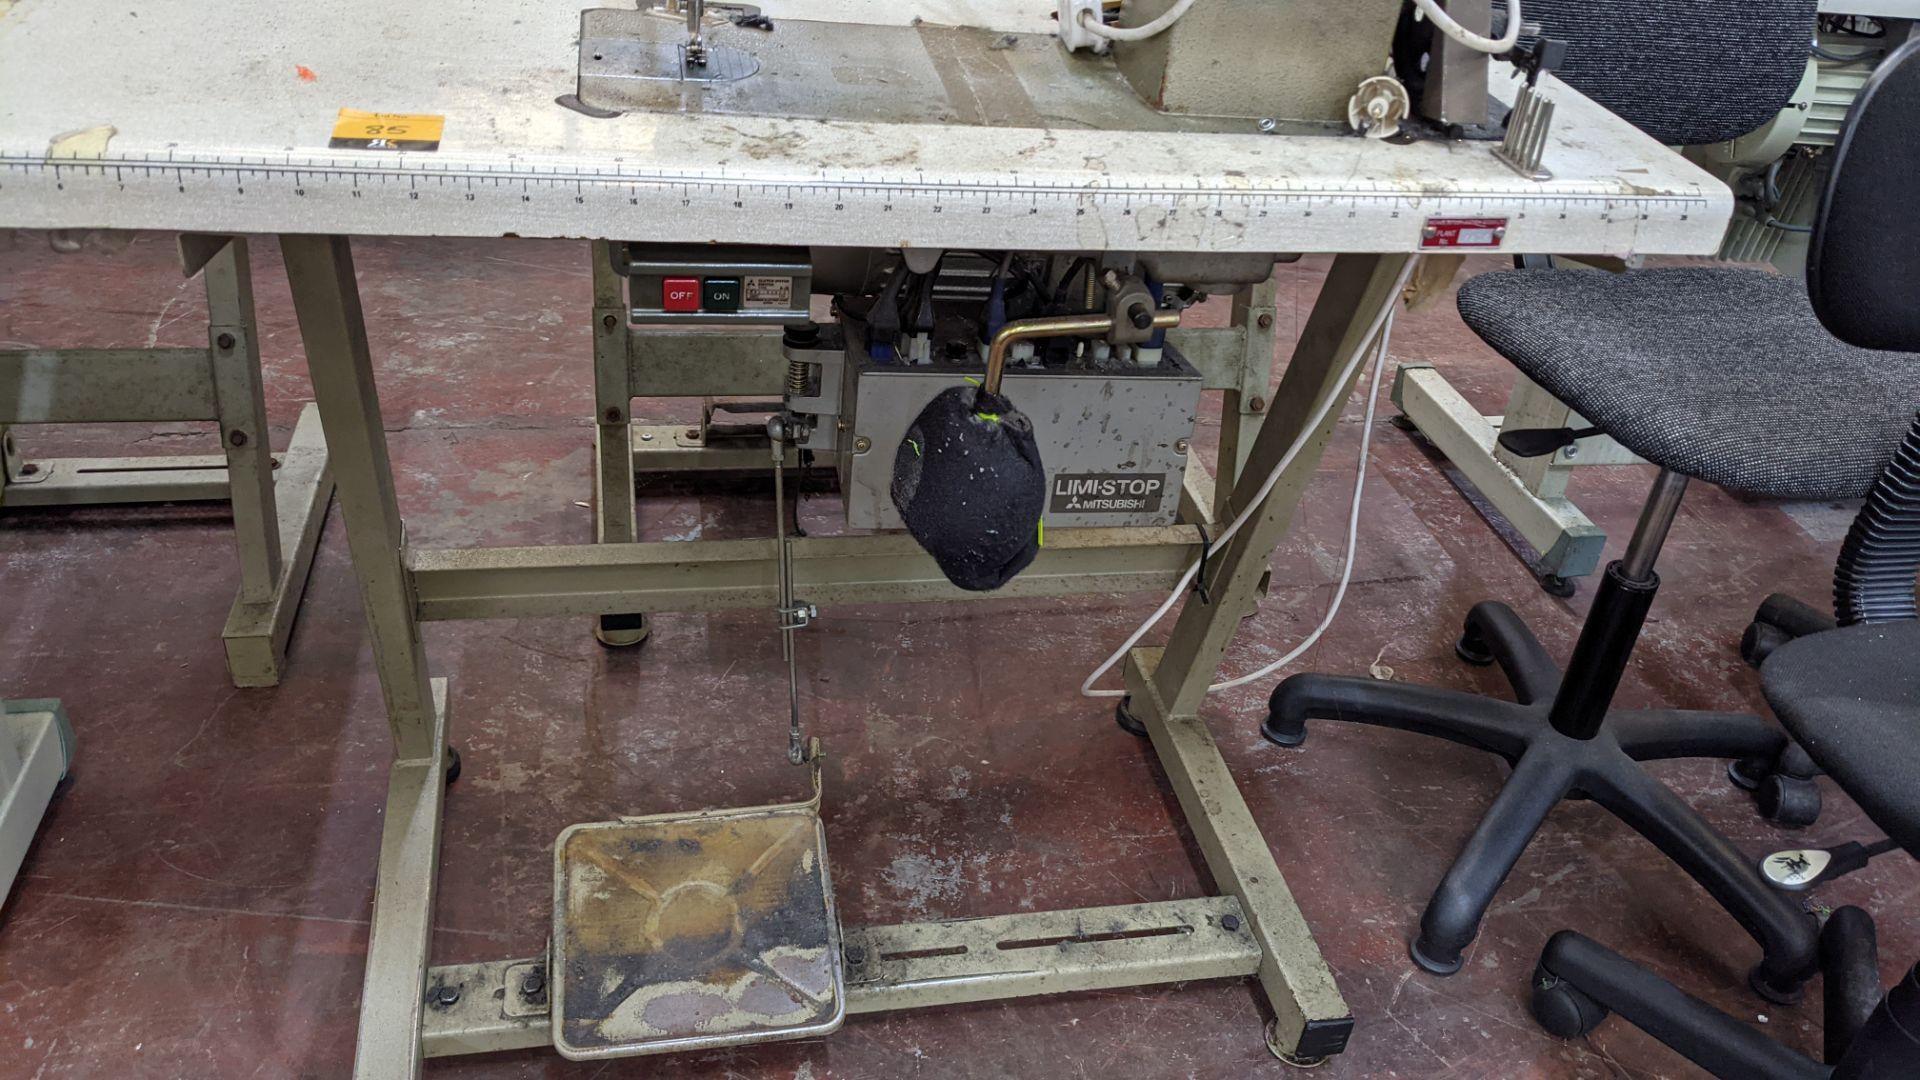 Mitsubishi LS2-180 sewing machine with Mitsubishi LF-C8 digital controller - Image 10 of 12